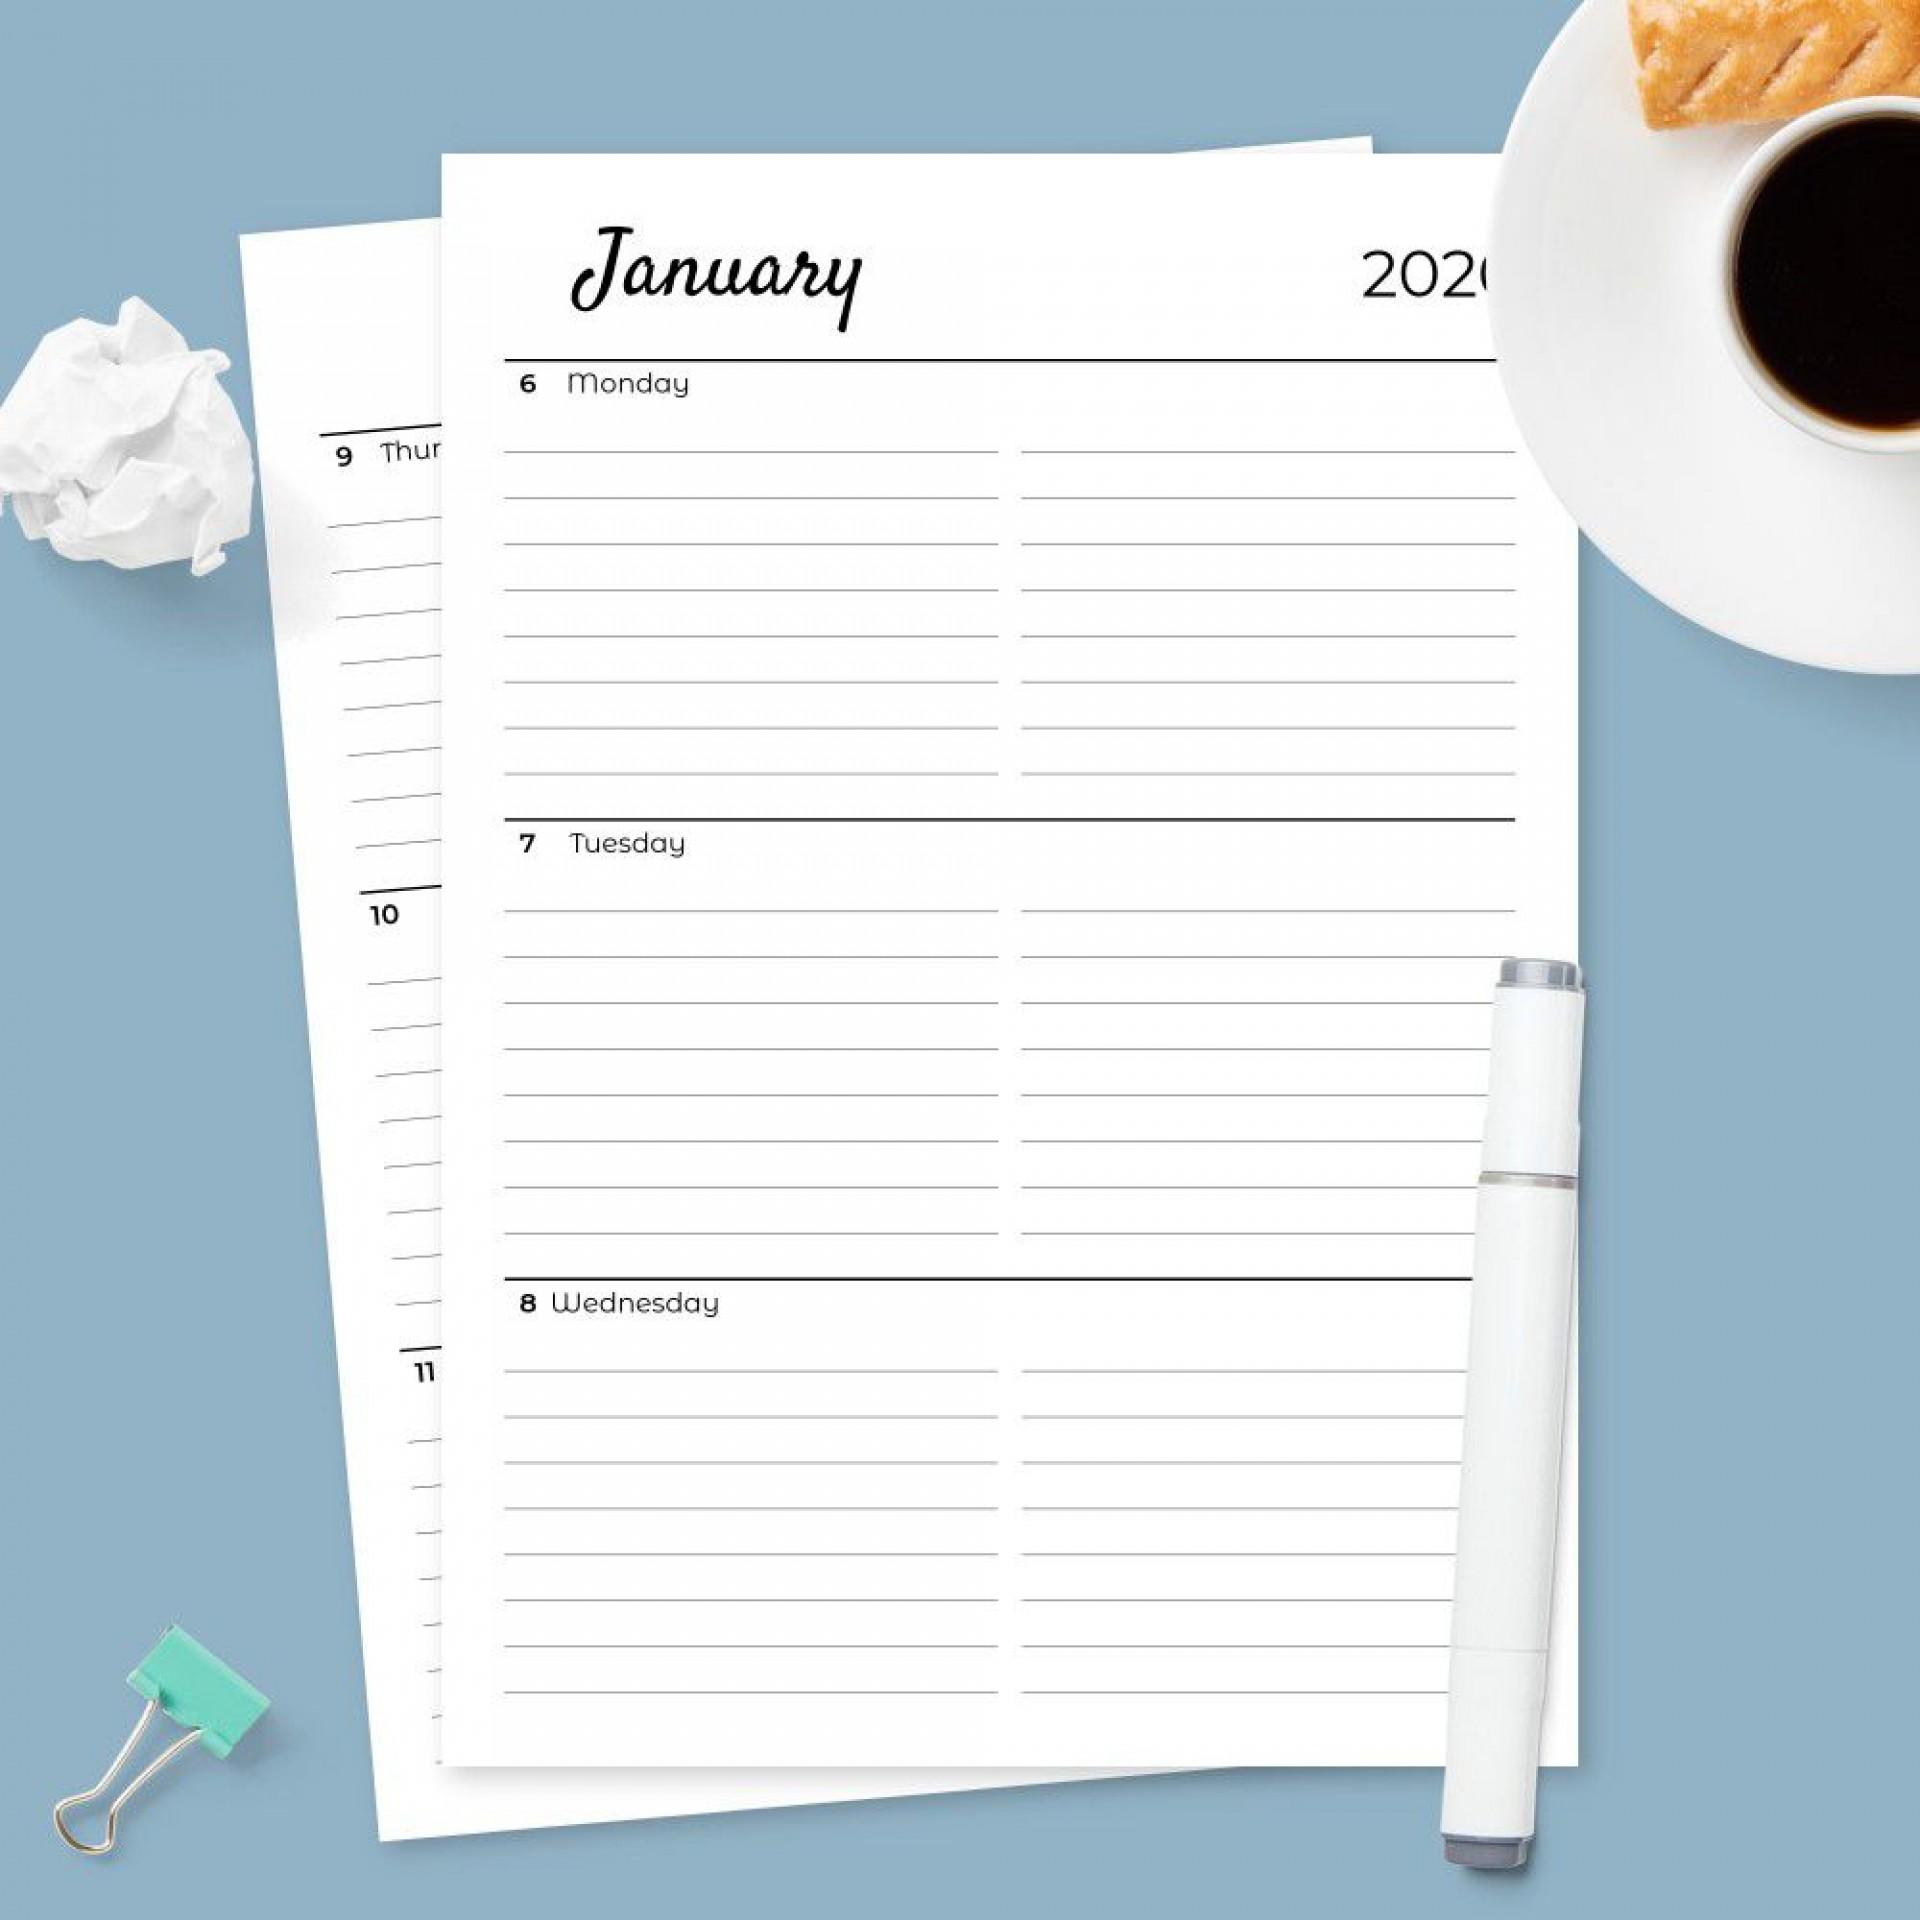 006 Amazing Google Doc Weekly Calendar Template 2021 Image  Free1920